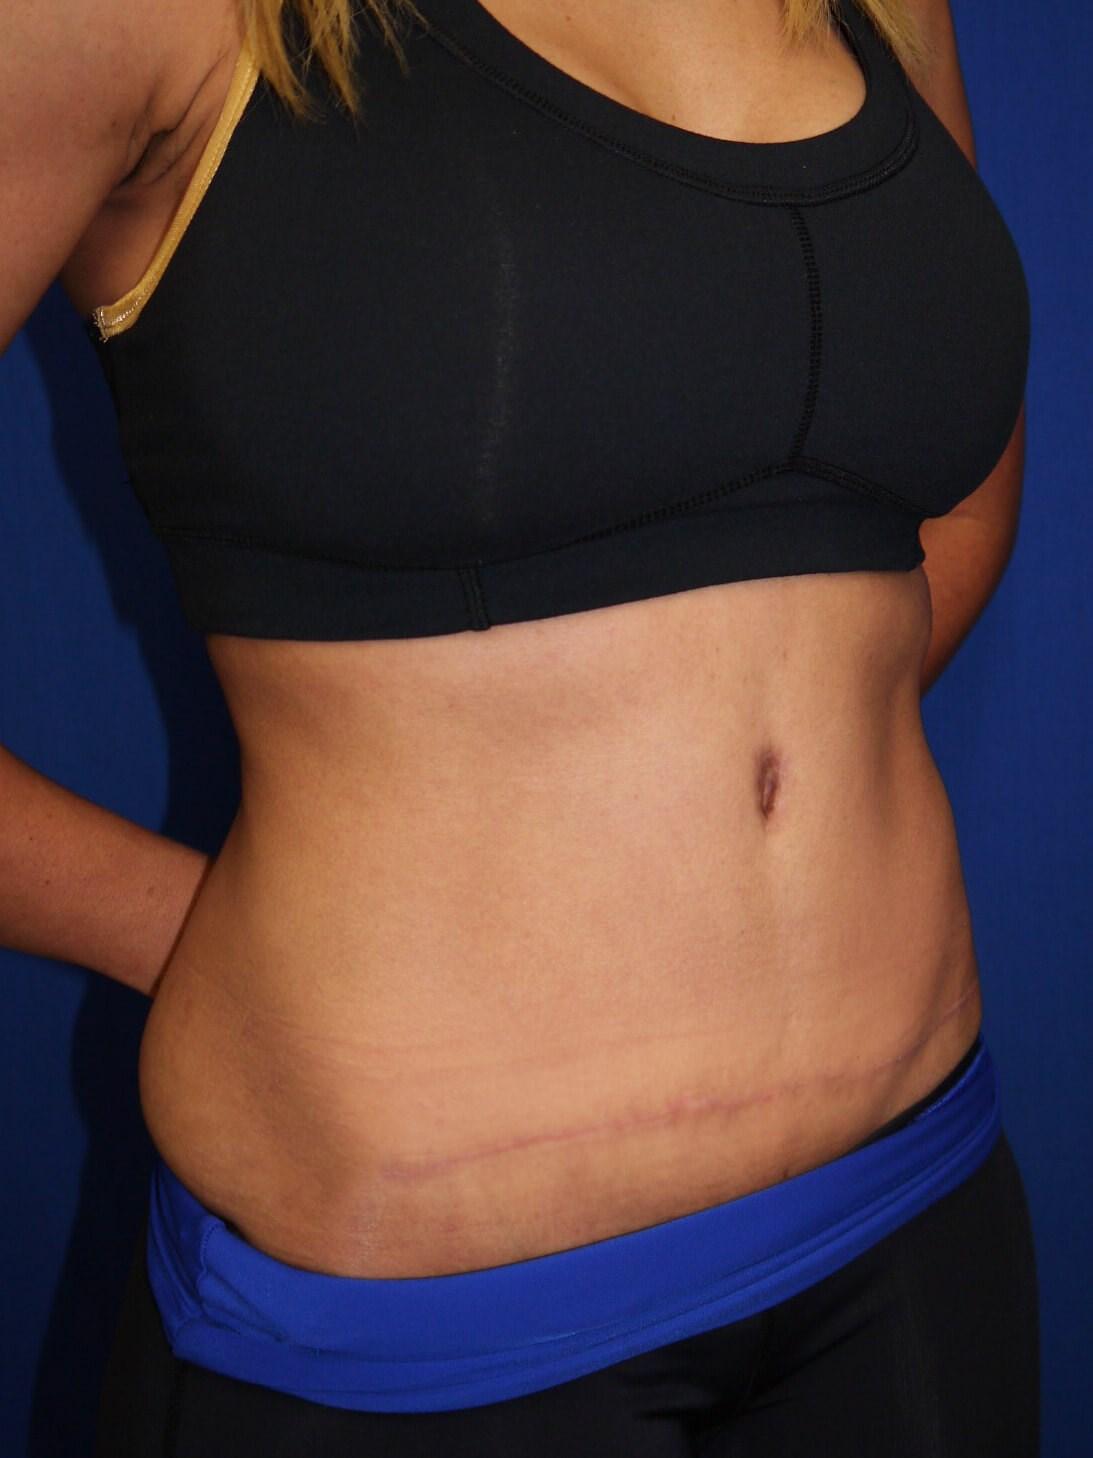 tummy tuck after - Right Oblique View - Right Oblique View